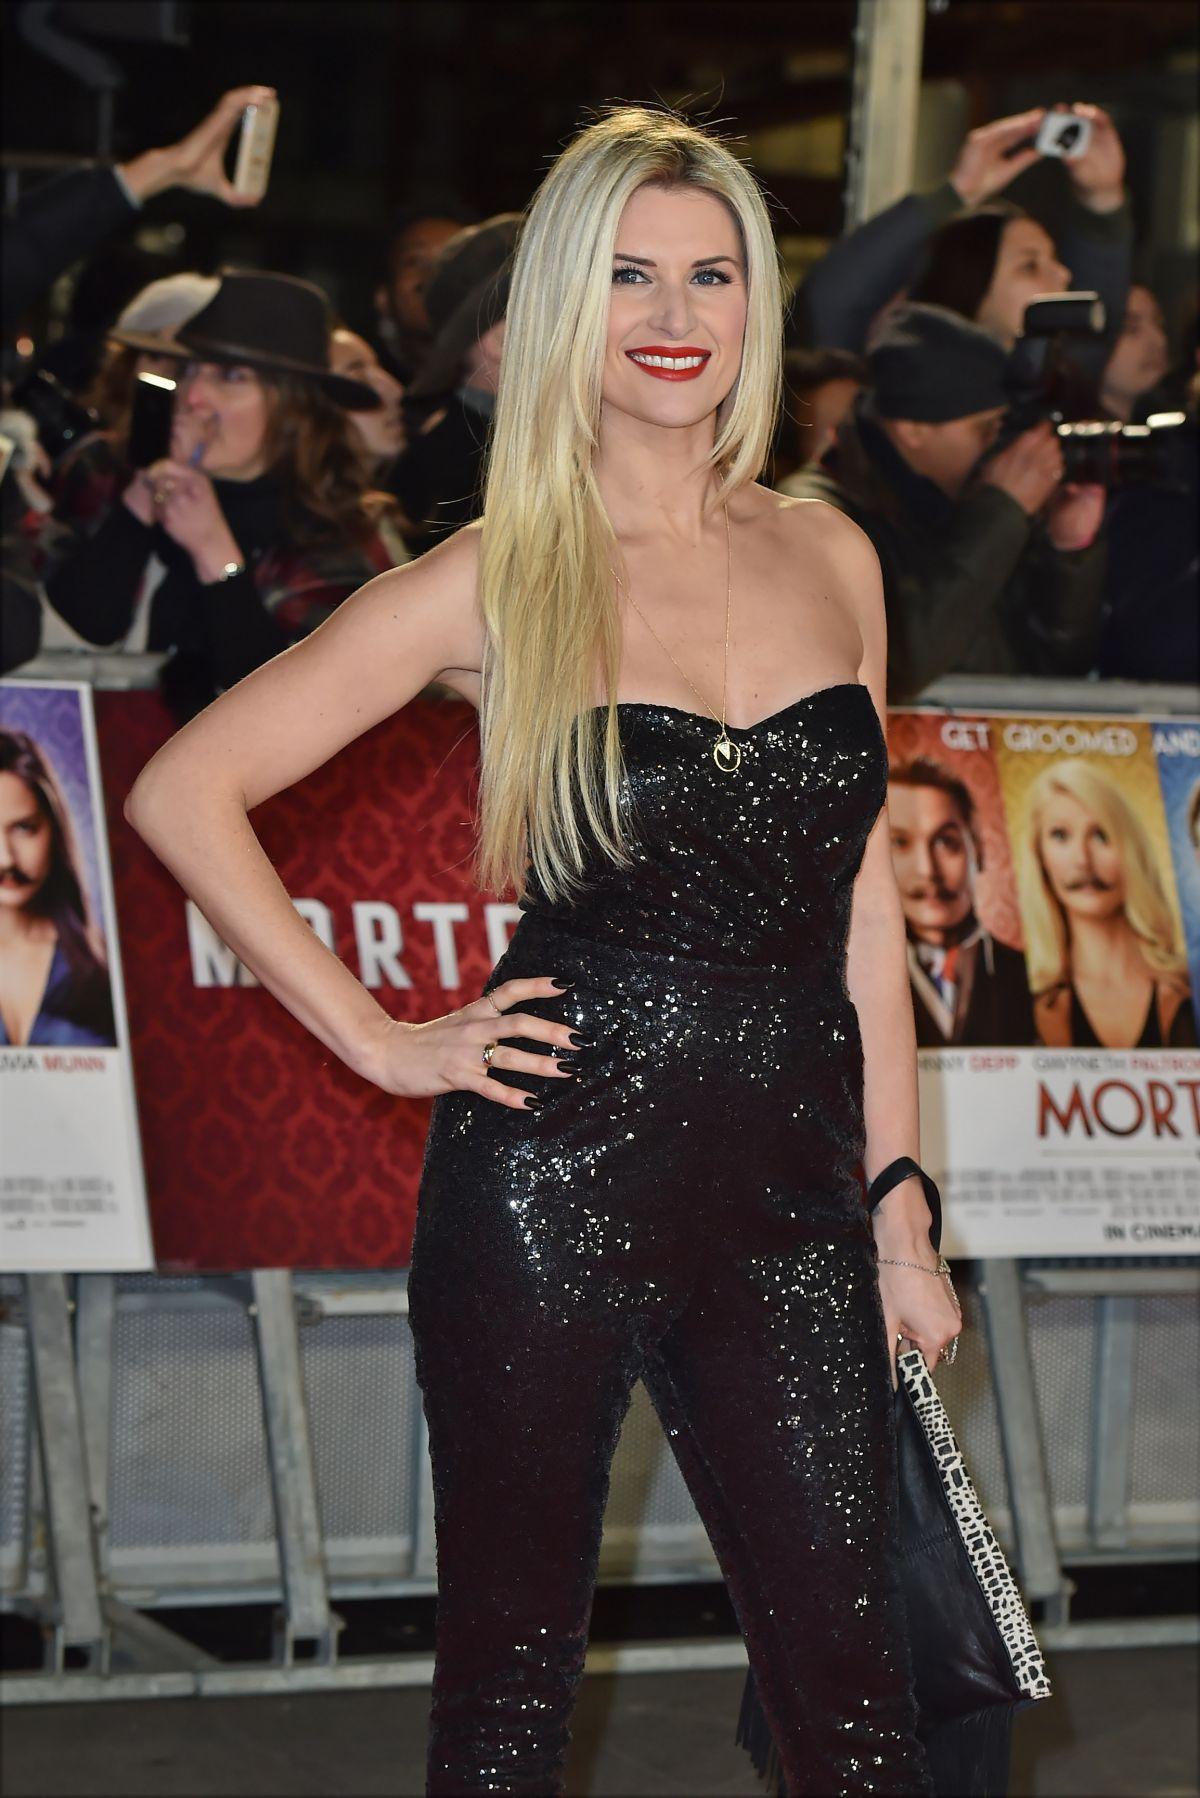 SARAH JAYNE DUNN at Mortdecai Premiere in London